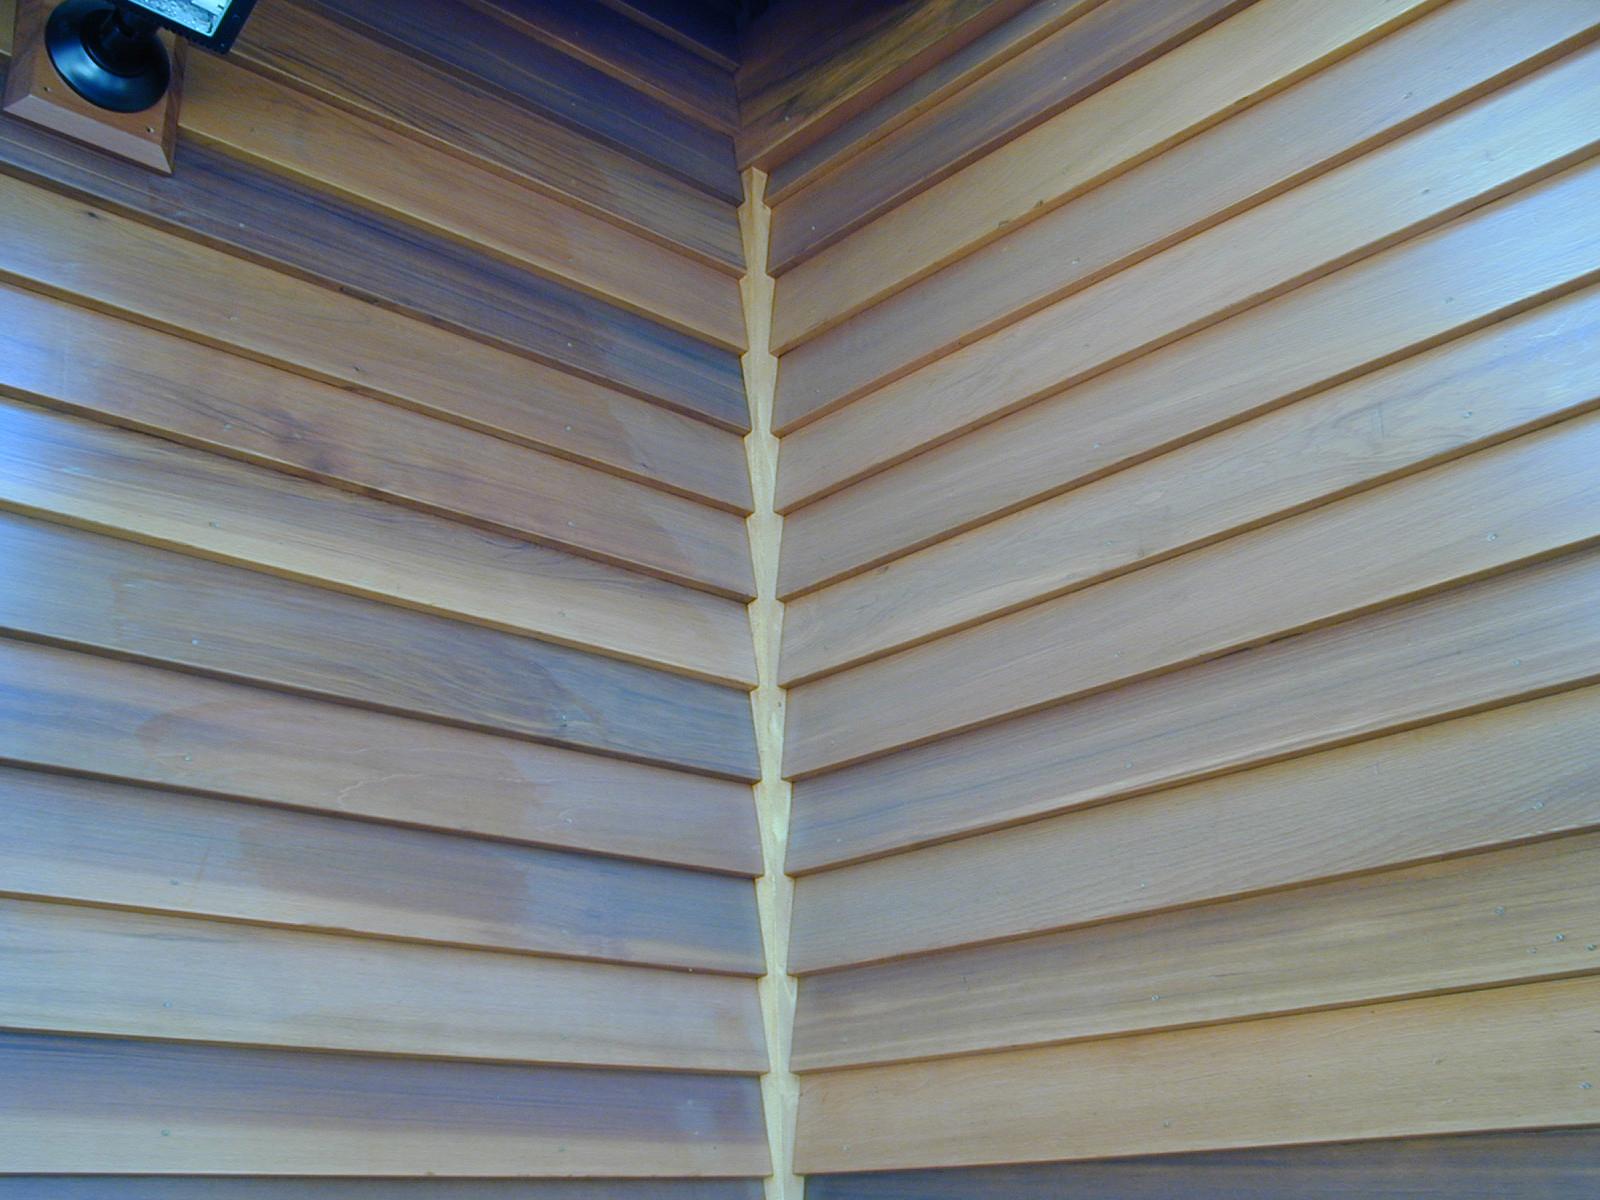 Exterior Siding Western Red Cedar Bevel Clear Grain